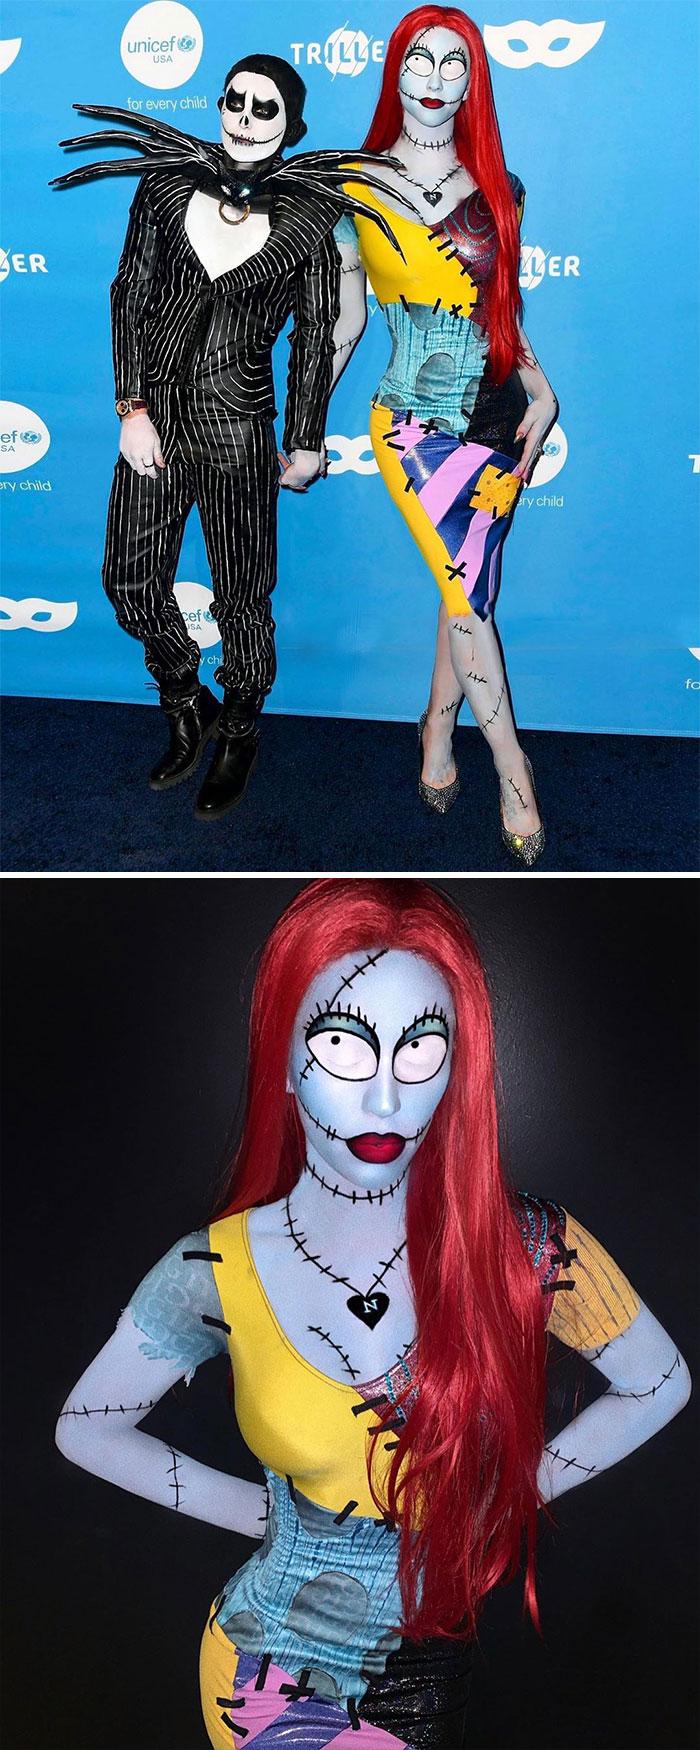 Gigi Gorgeous And Nats Getty Gorgeous As Jack Skellington And Sally